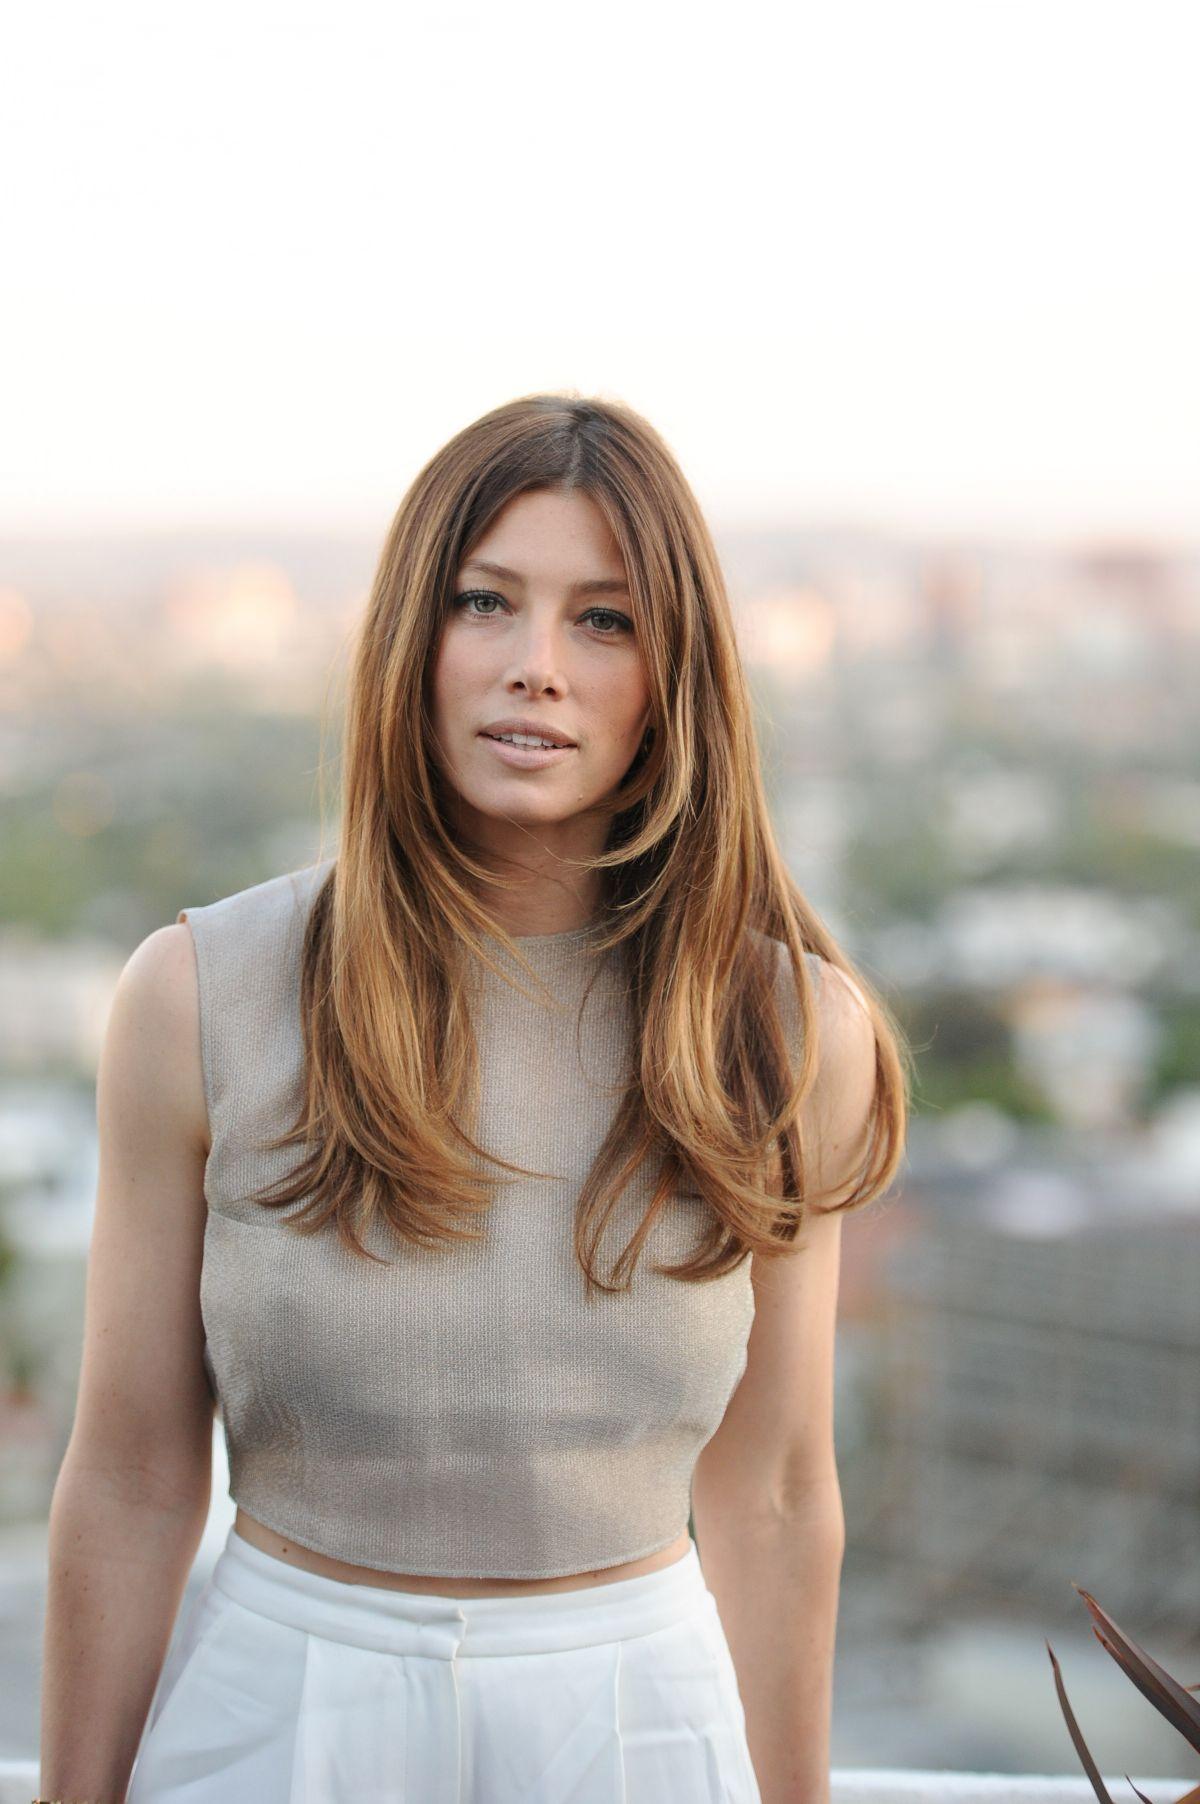 JESSICA BIEL at Tiffany & co. Bash in Hollywood - HawtCelebs